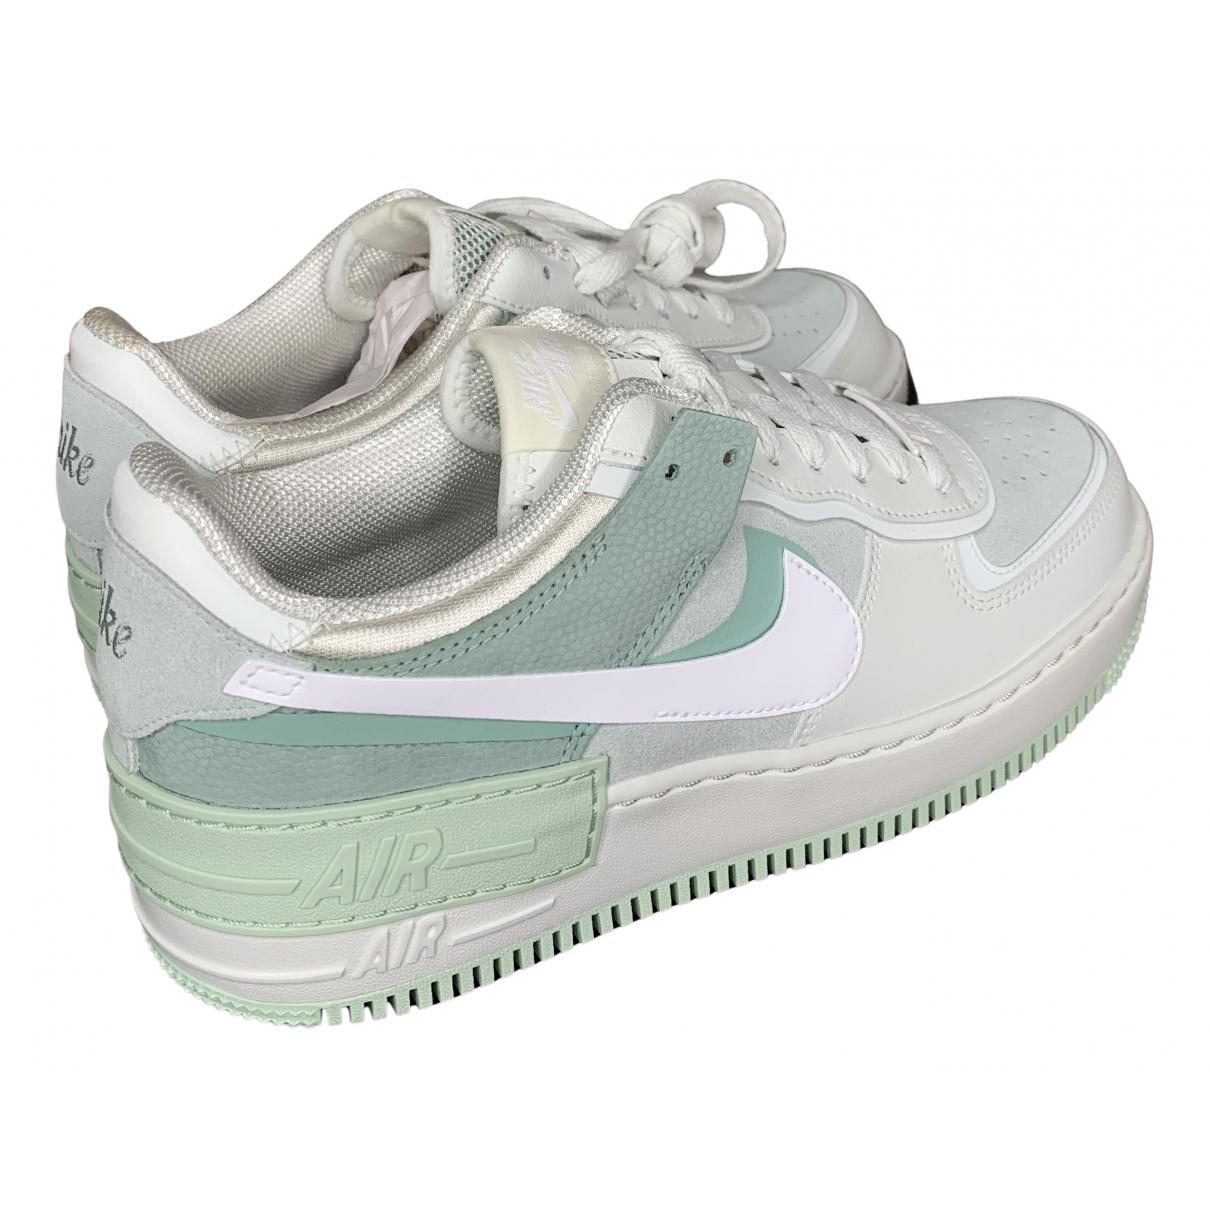 Nike - Baskets Air Force 1 pour homme en cuir - vert